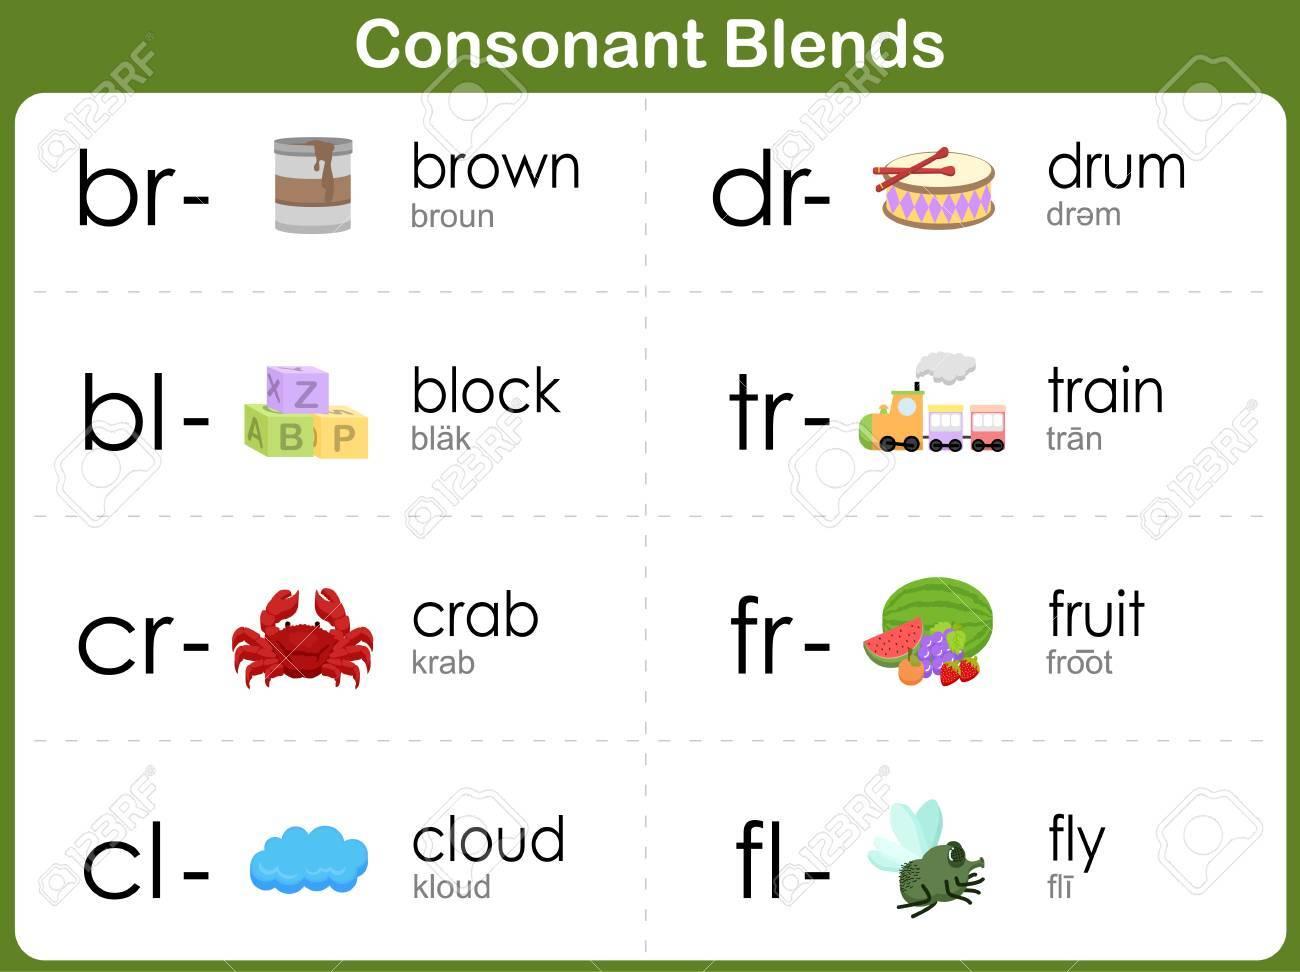 Consonant Blends Worksheet For Kids regarding Alphabet Blends Worksheets